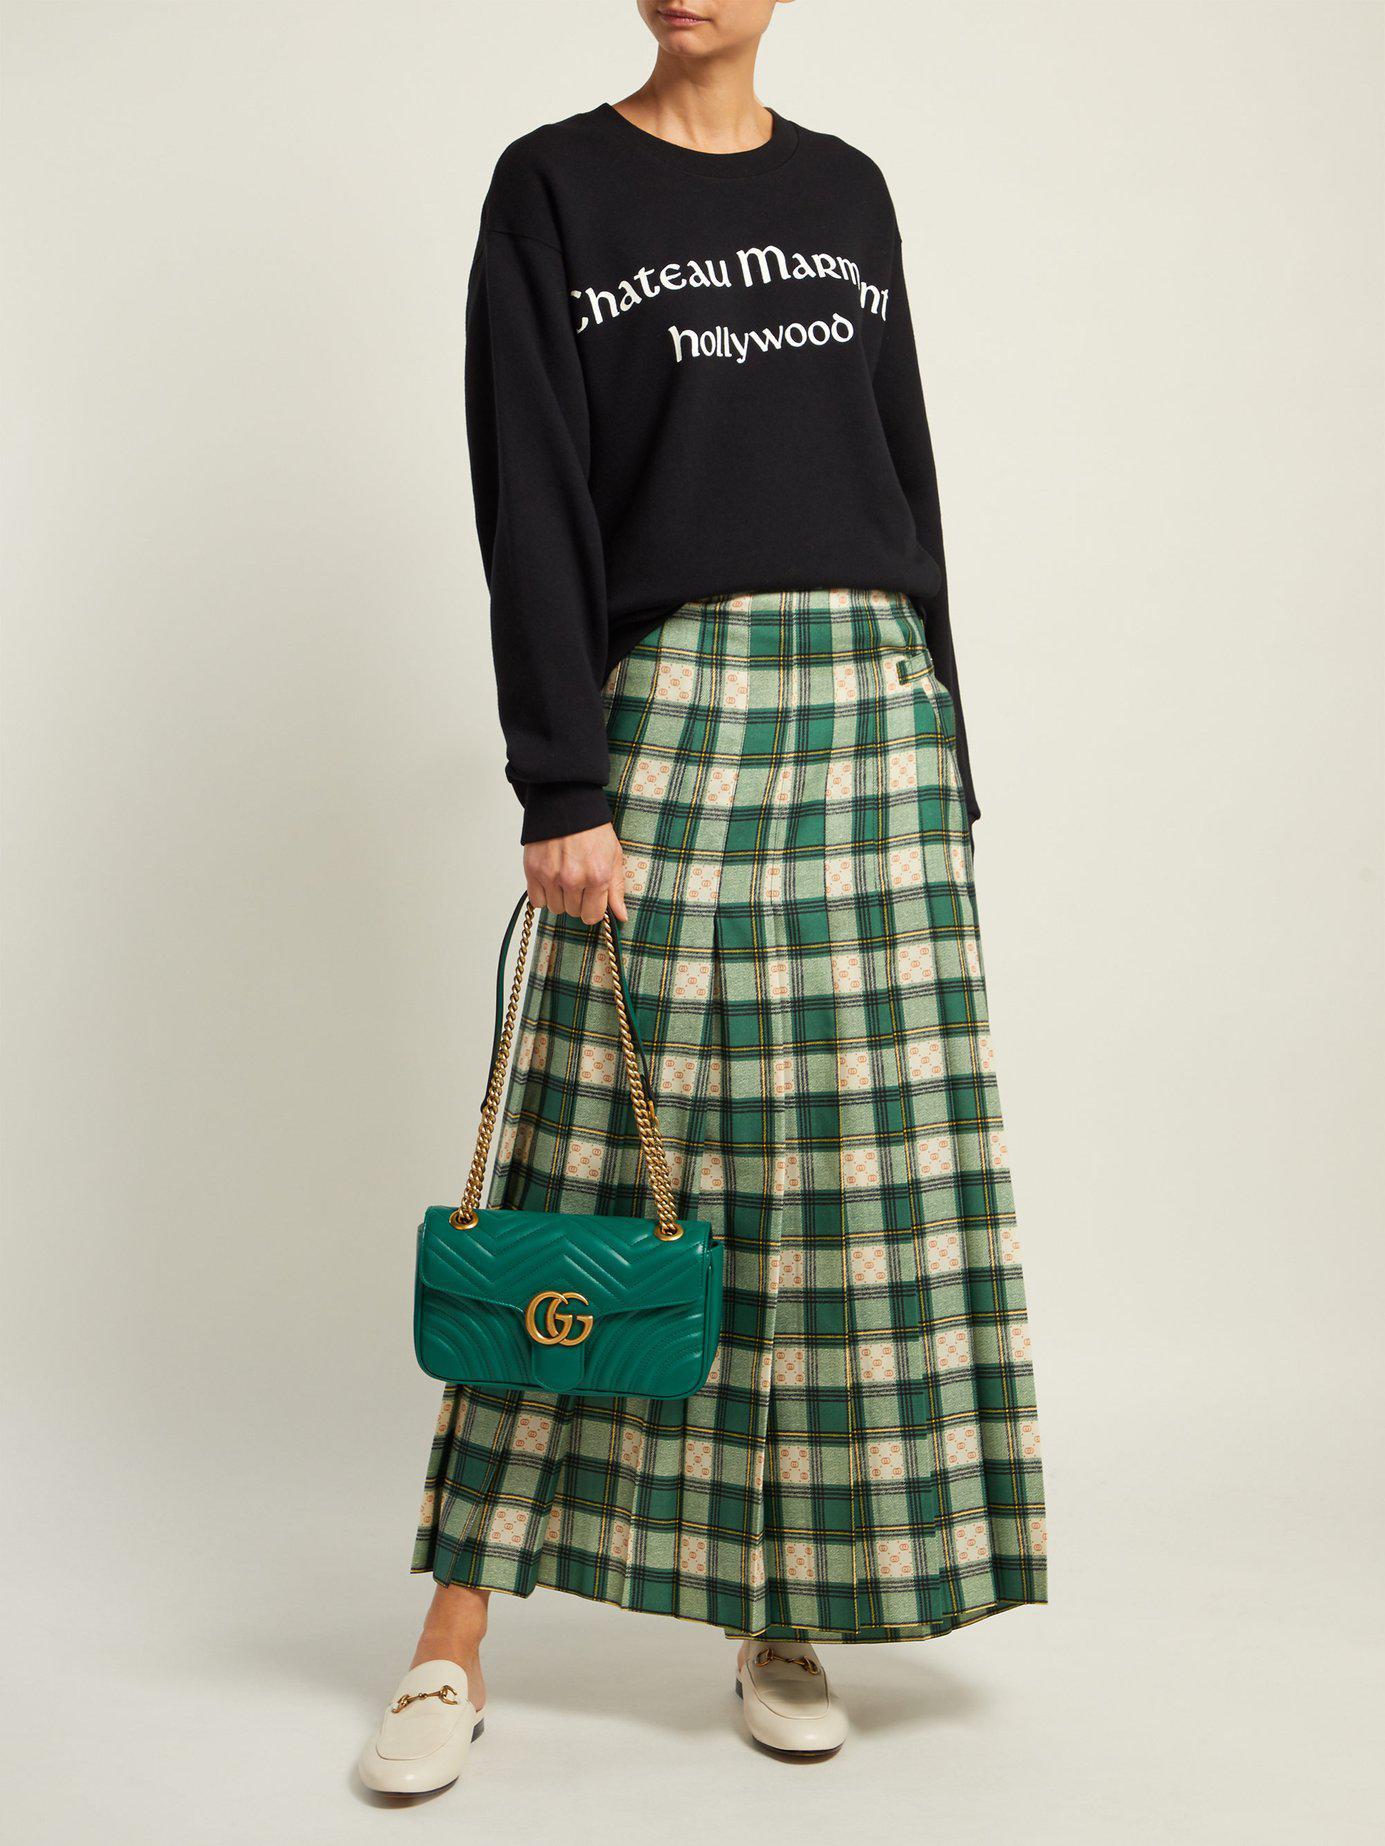 963d08fa33de Gucci Women's GG Marmont Matelassé Mini Bag - Red in Green - Save 10% - Lyst